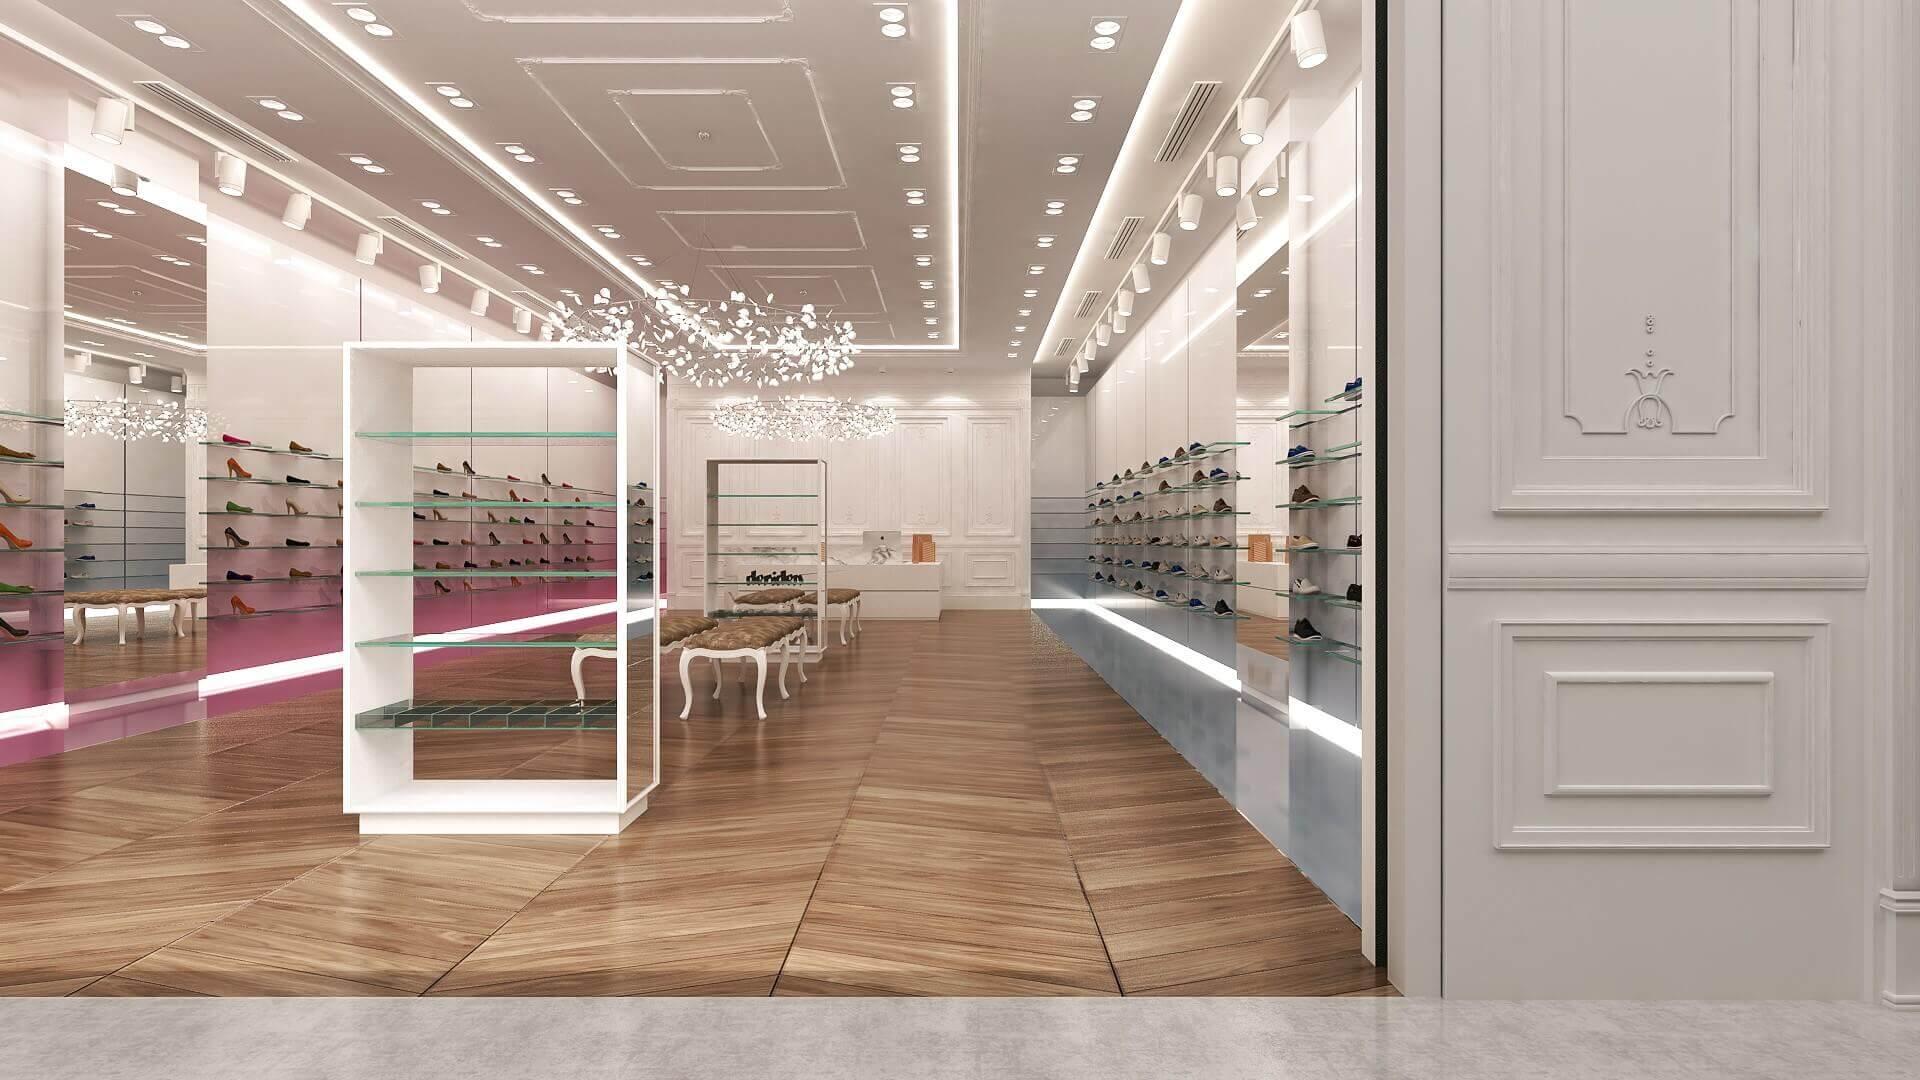 perakende mağaza 2020 Deriden Konsept Perakende